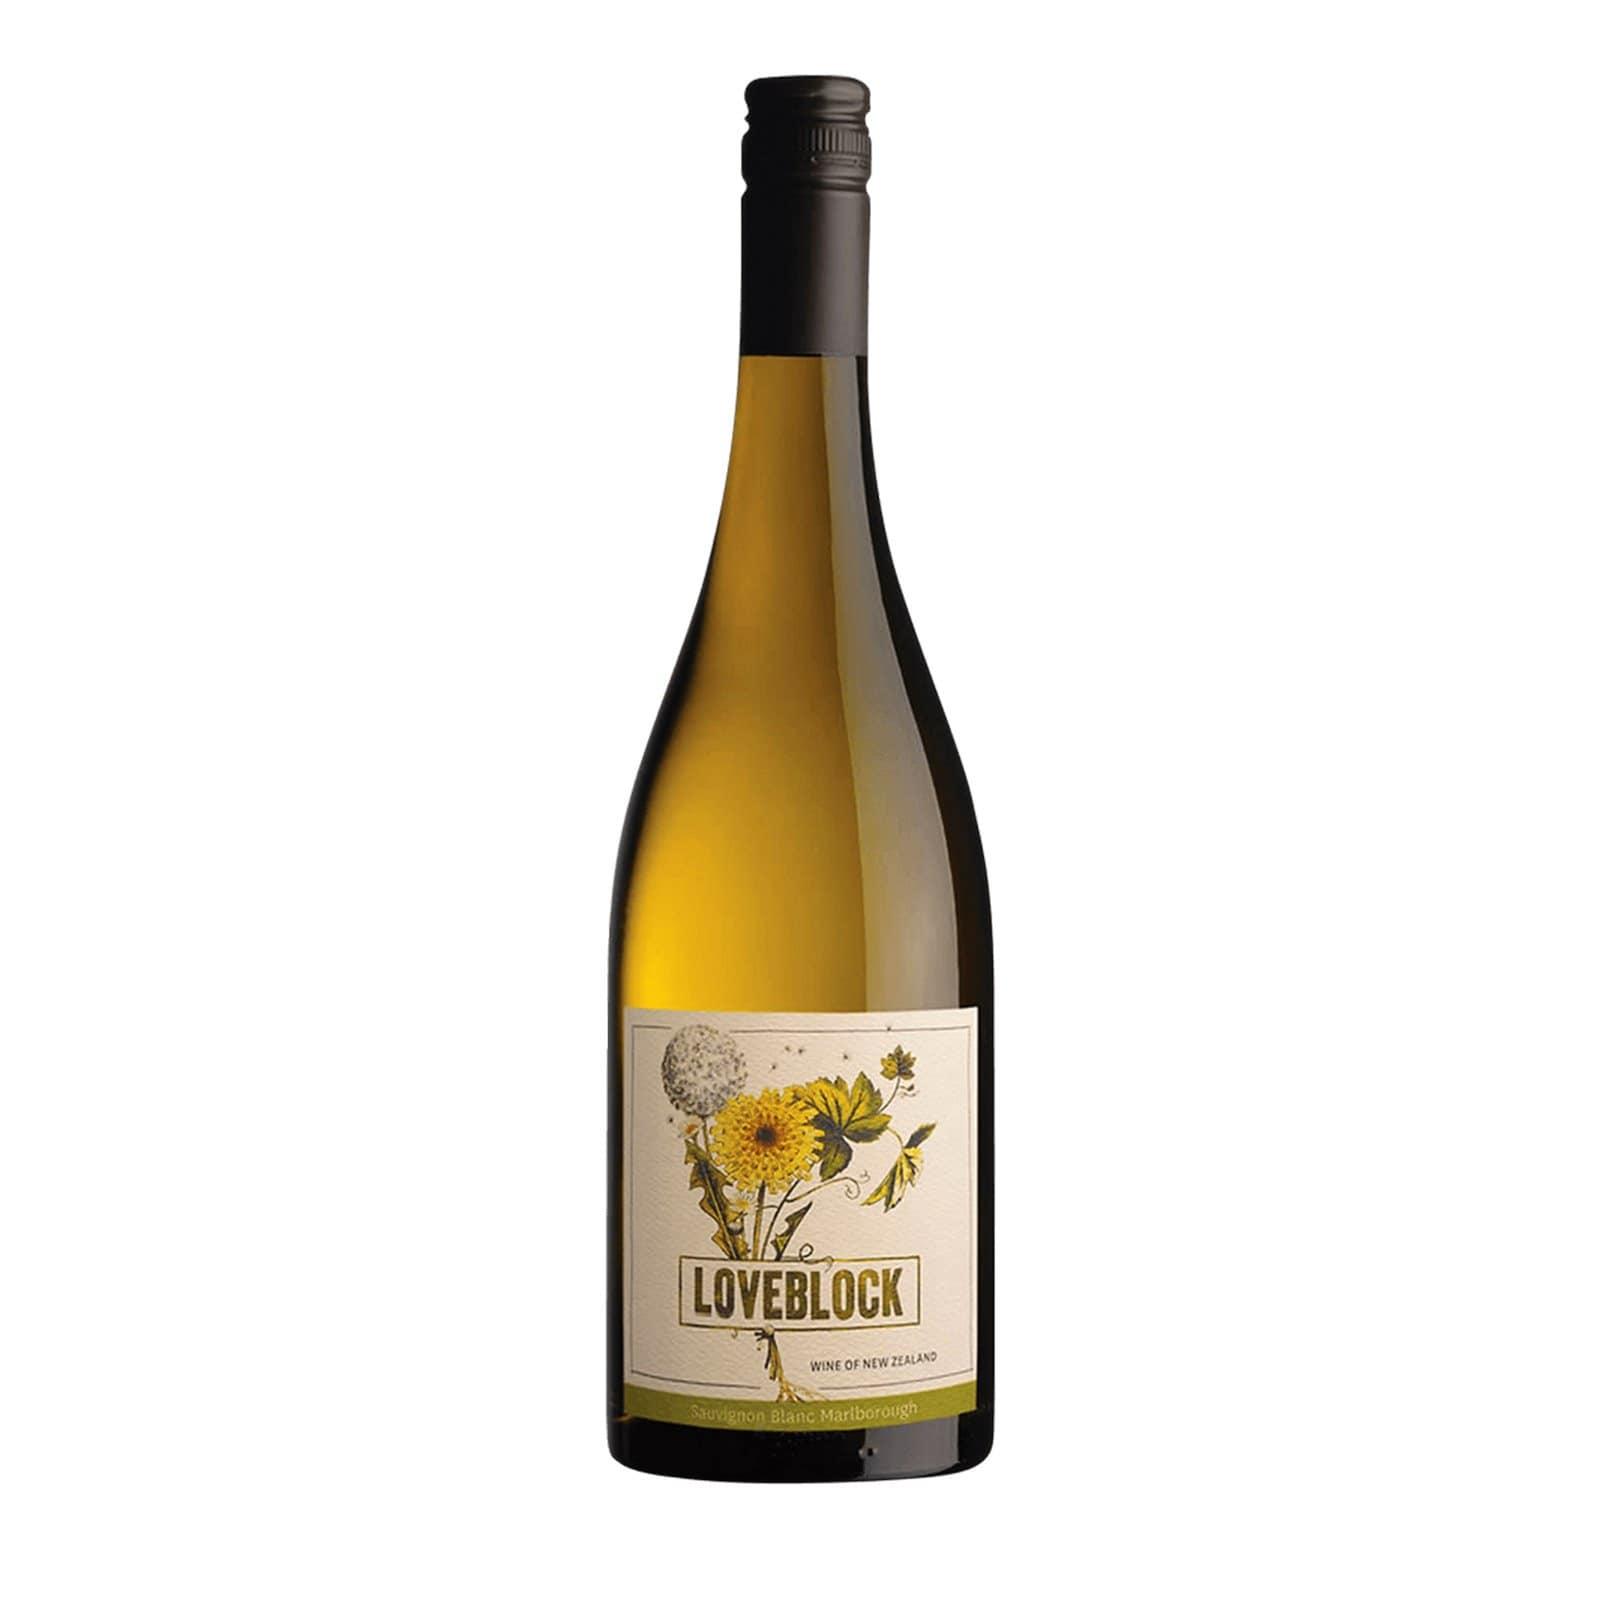 Loveblock Sauvignon Blanc 2019